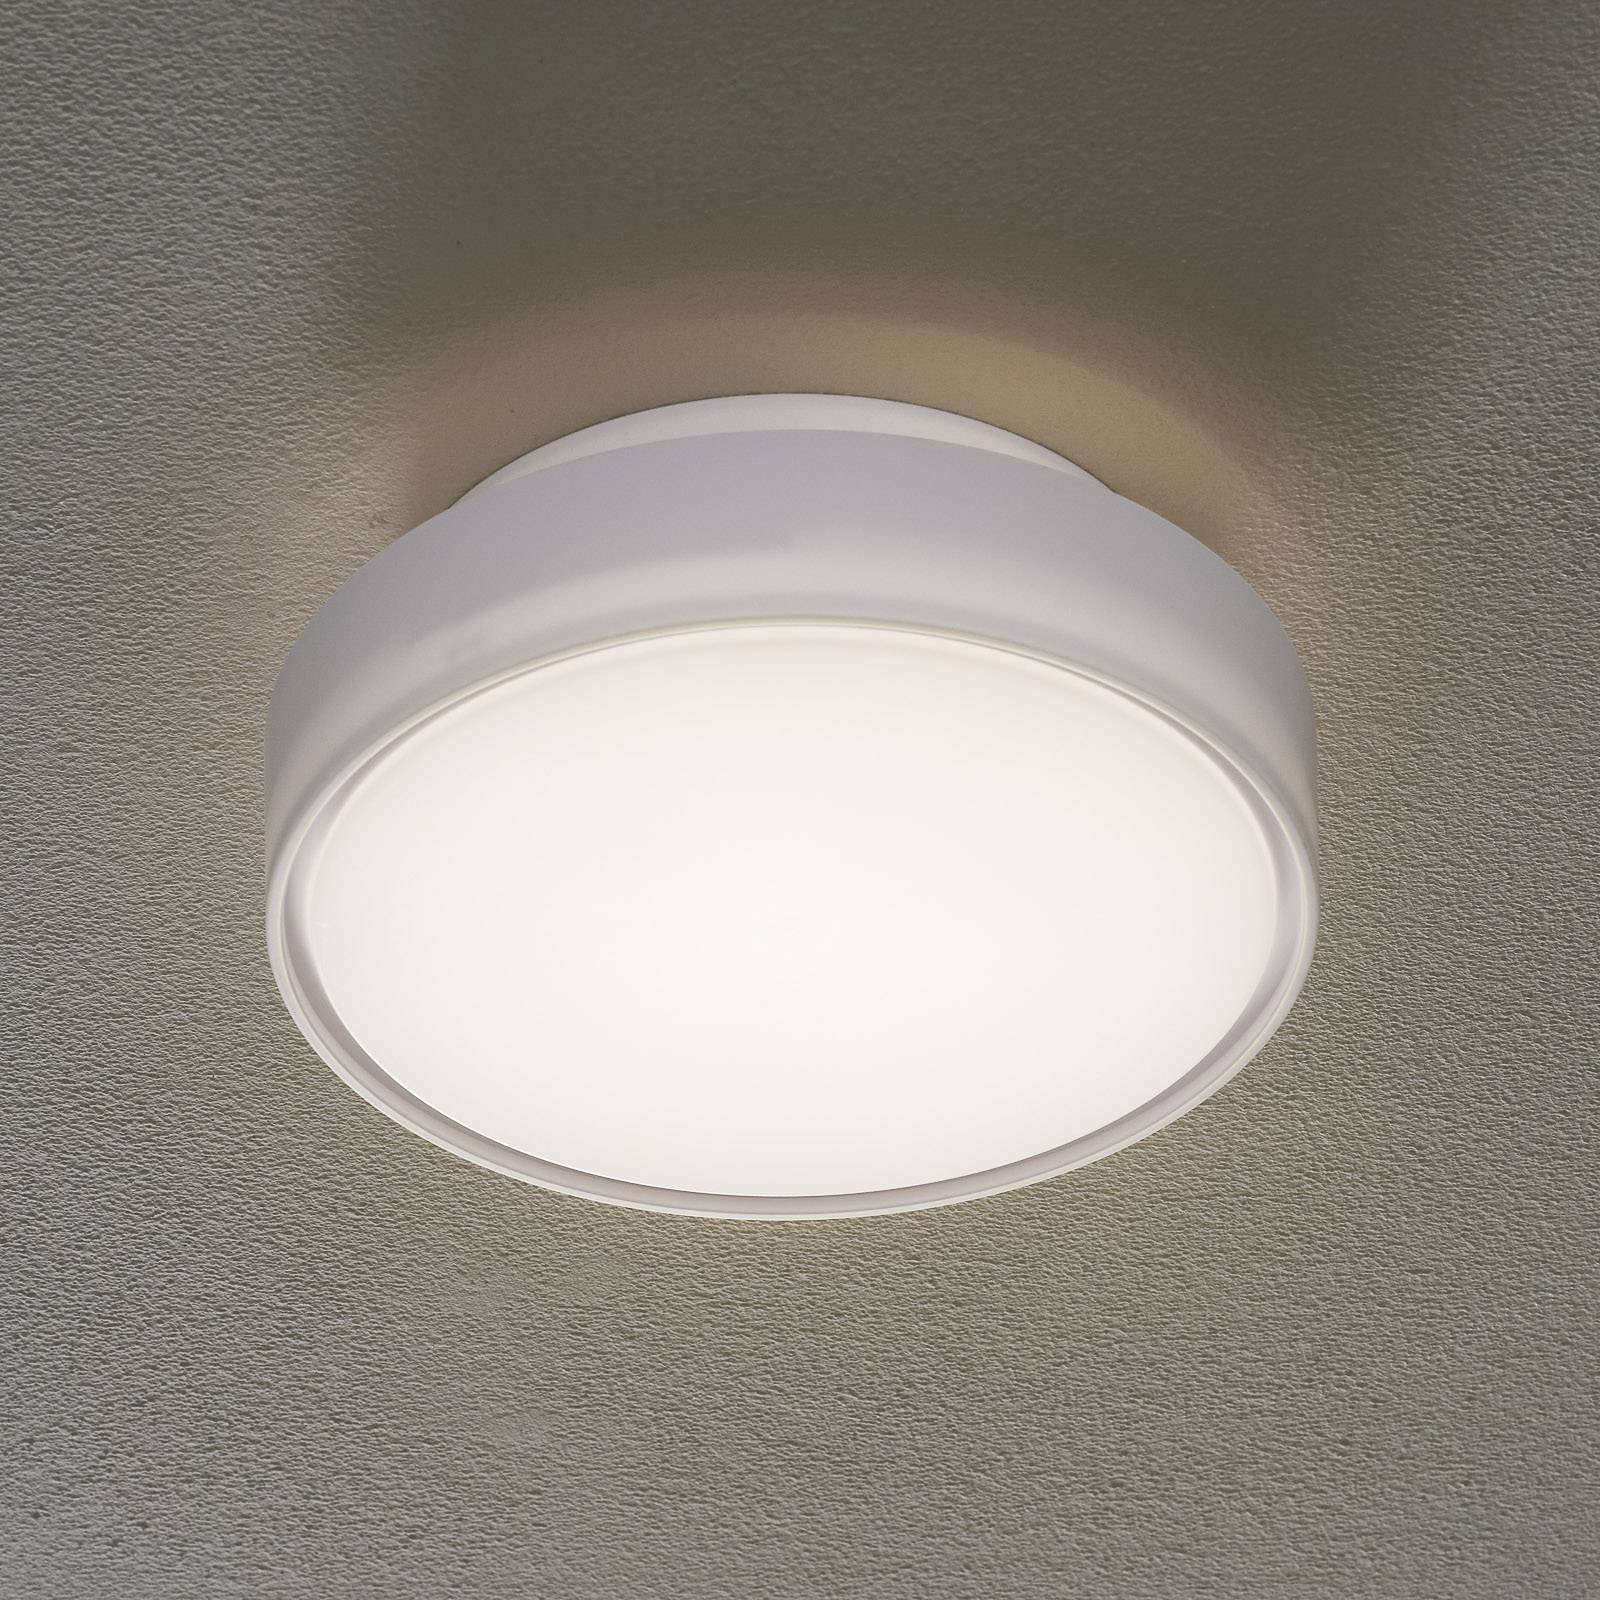 LED-taklampe Hatton IP65 25 cm